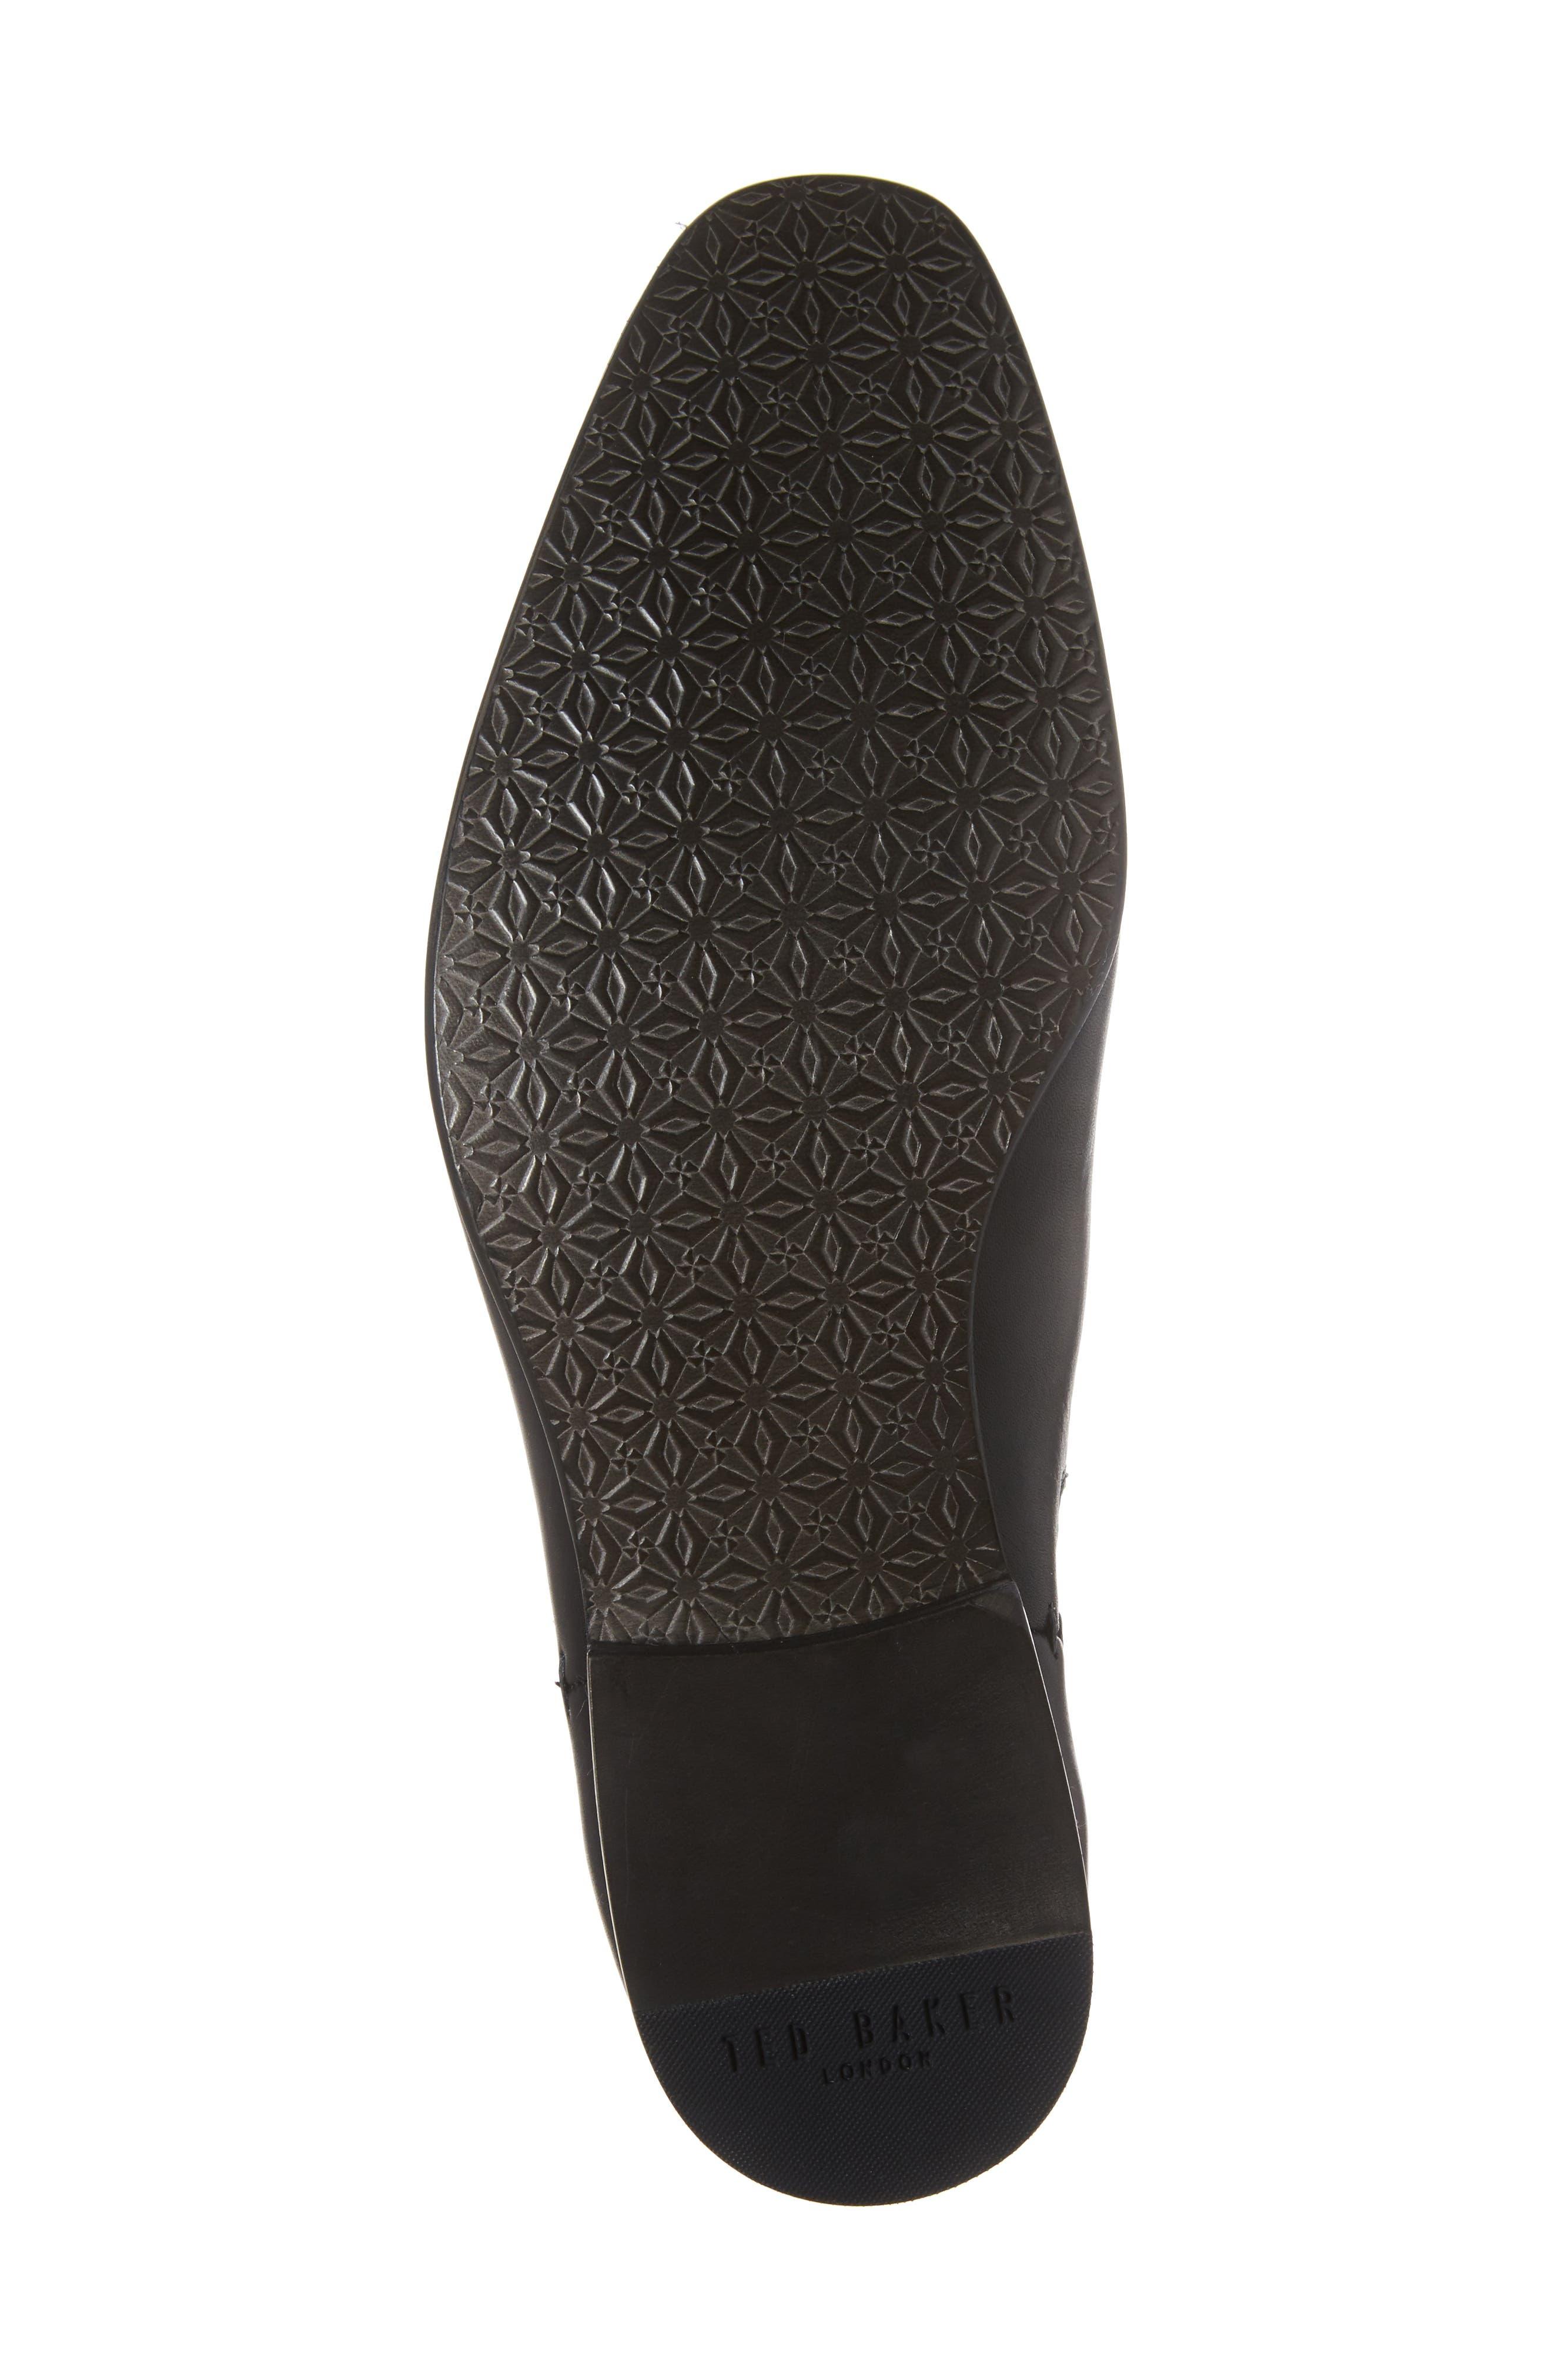 Kayto Chelsea Boot,                             Alternate thumbnail 6, color,                             Black Leather